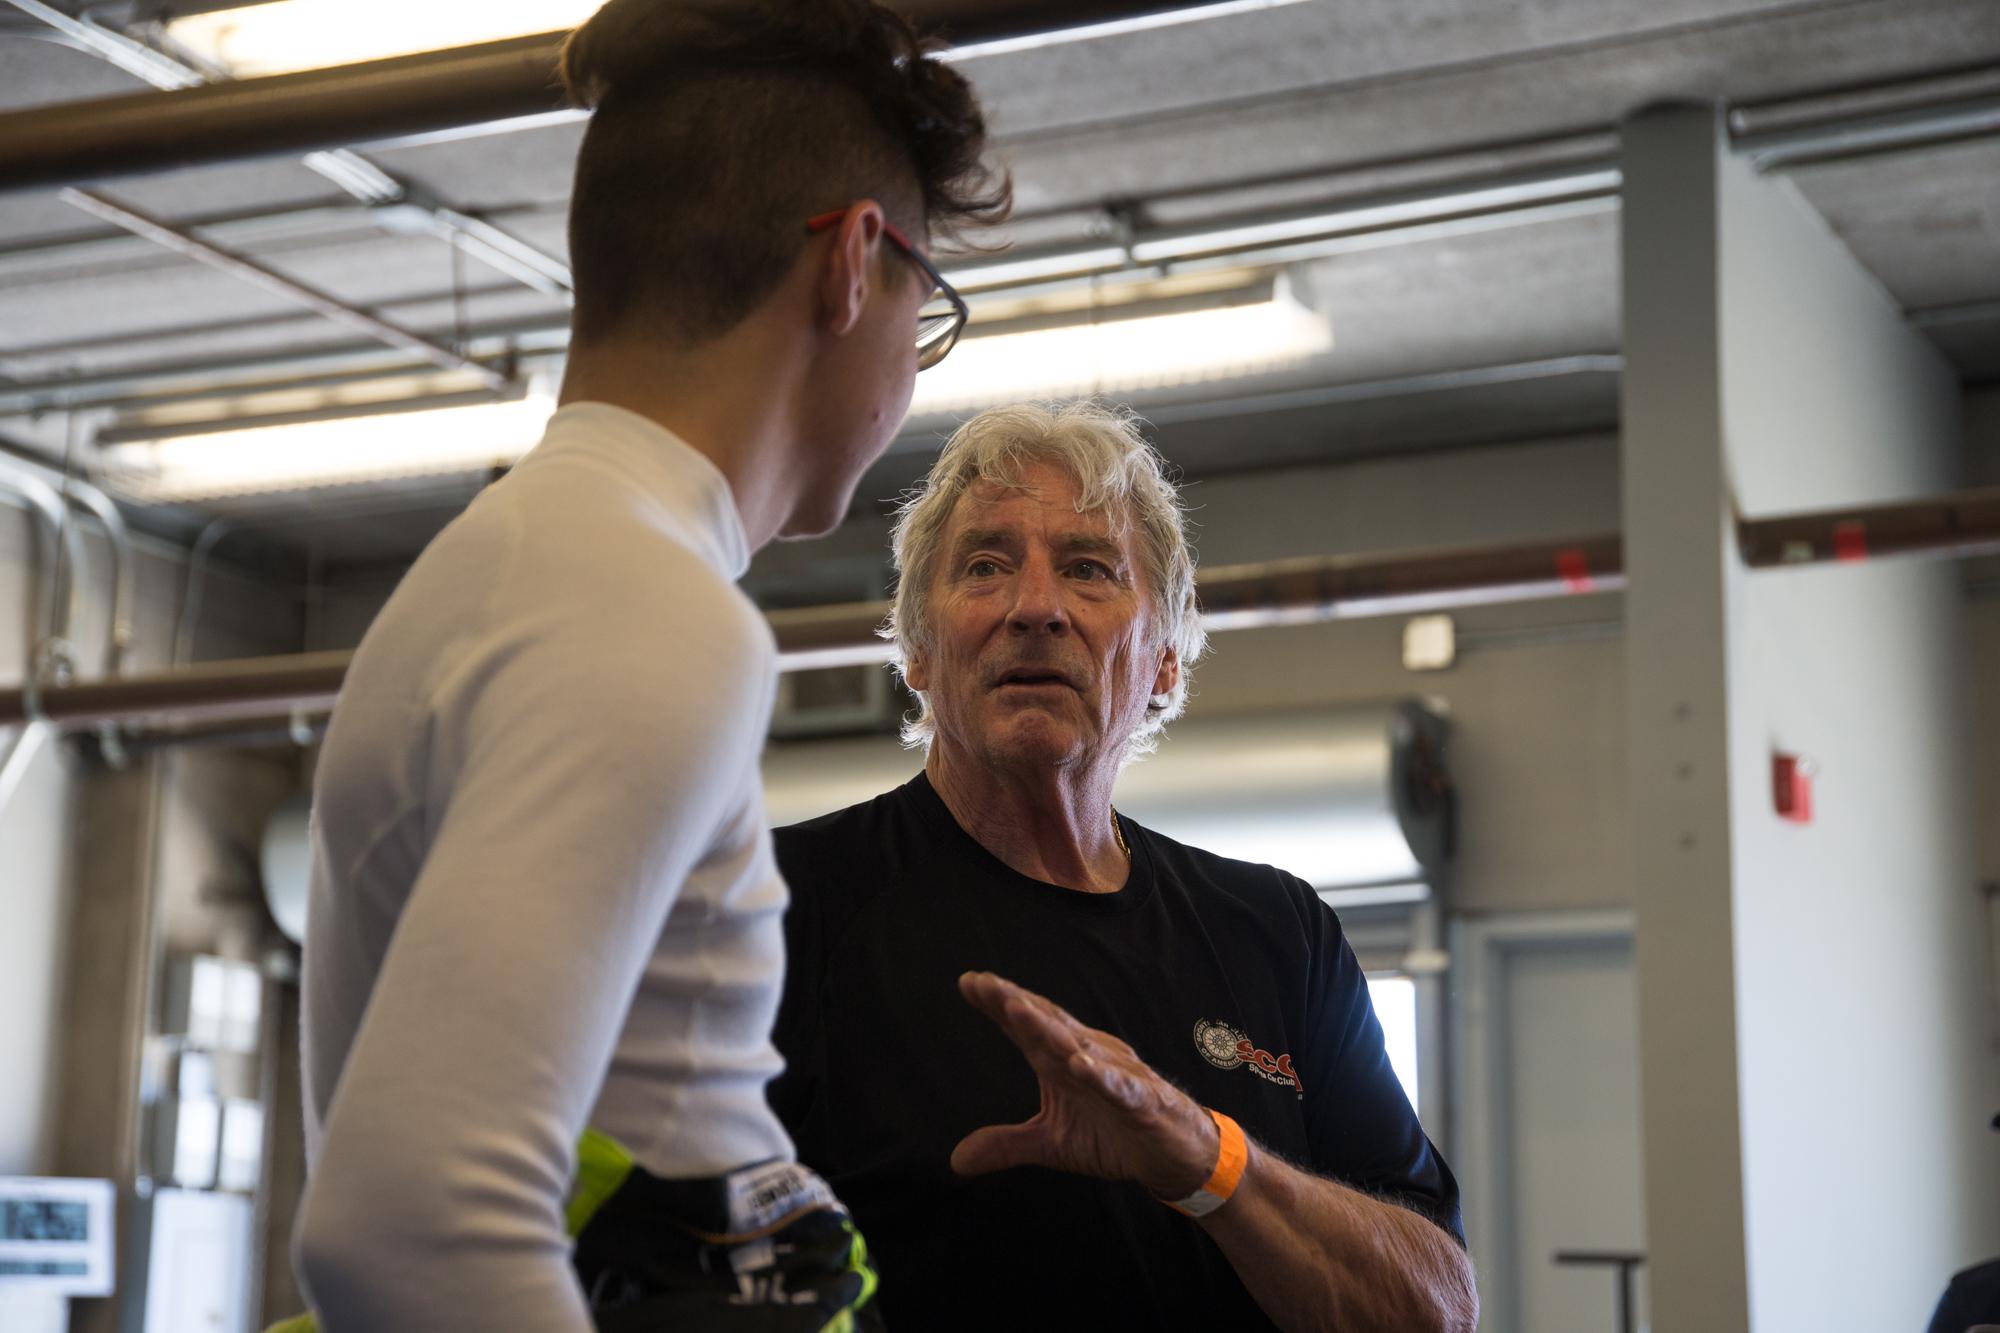 Steven-Racing-Laguna-20180601-96499.jpg